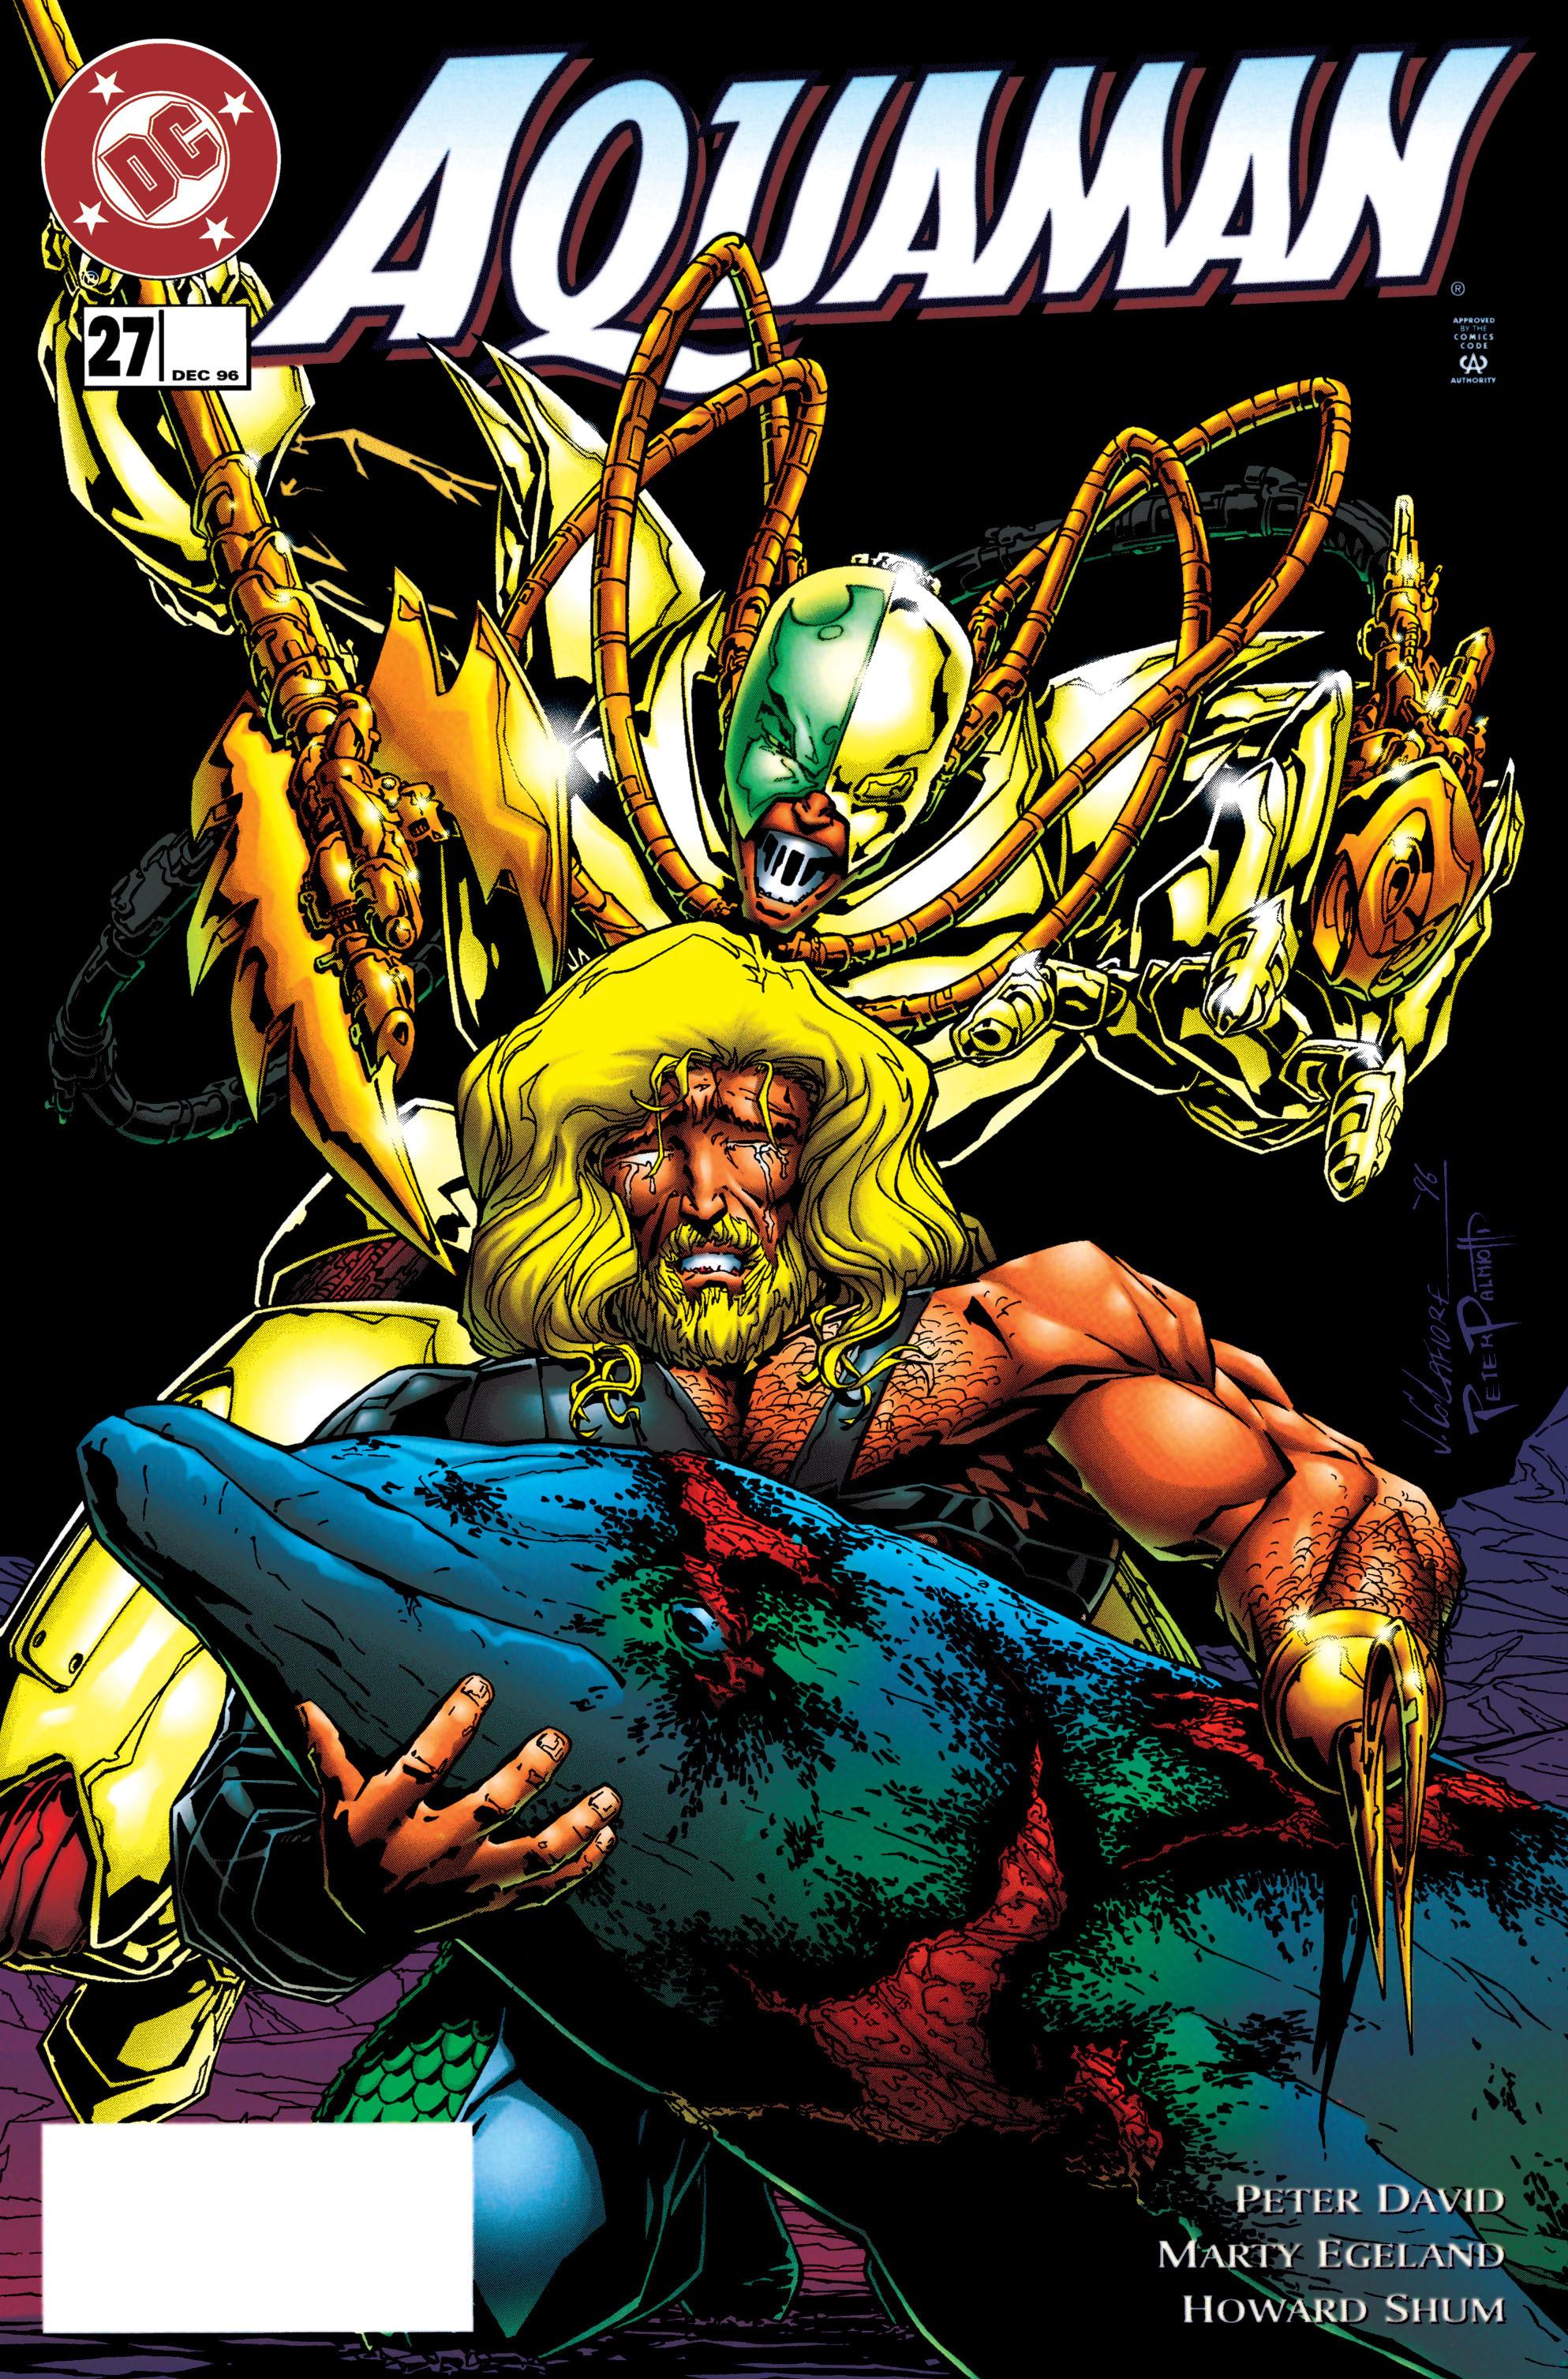 Read online Aquaman (1994) comic -  Issue #27 - 1